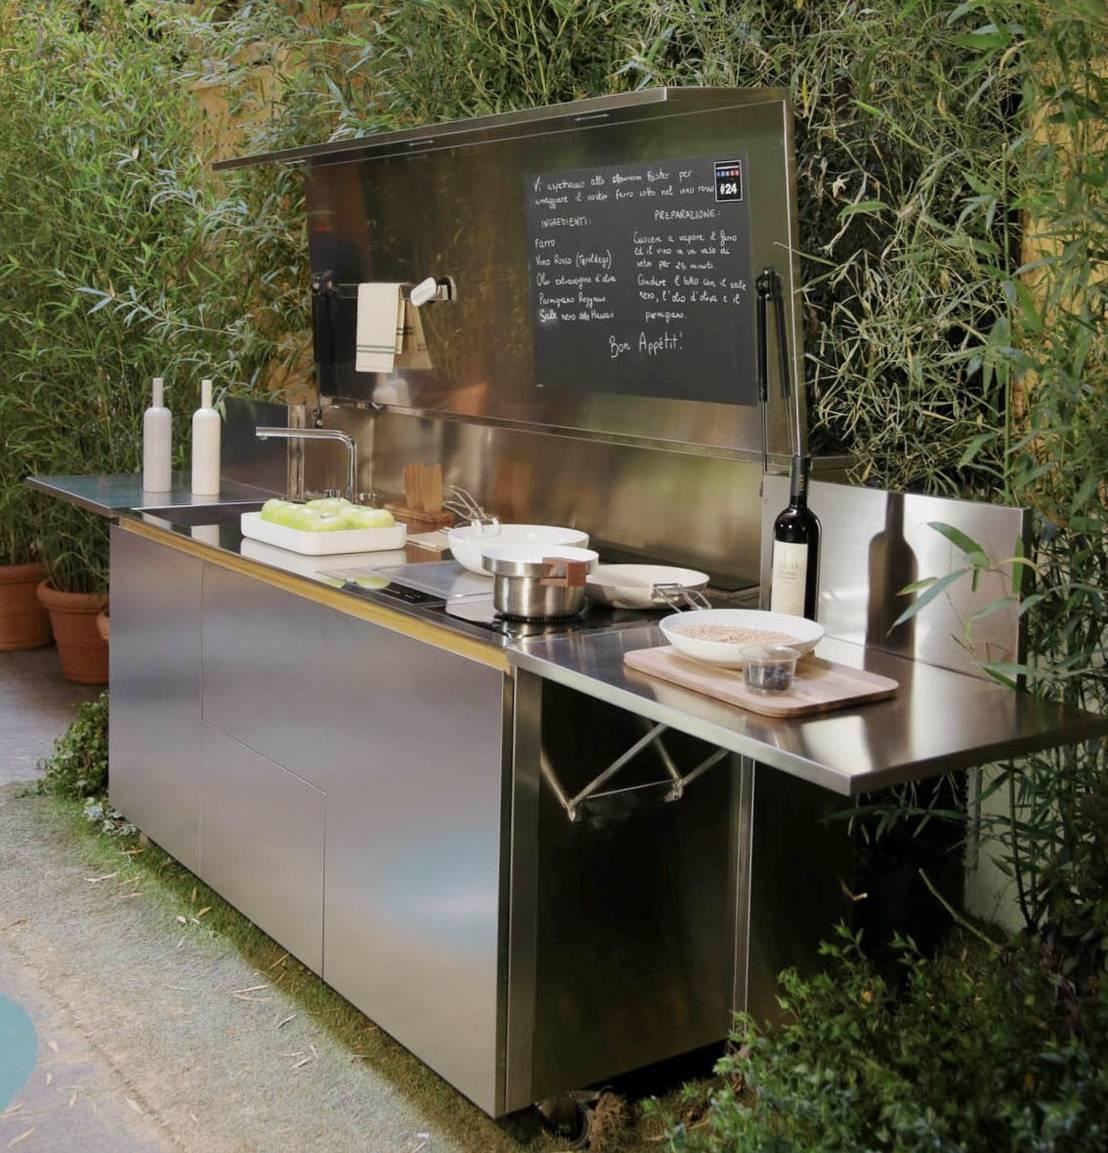 Cucina outdoor finalmente di steellart homify - Cucina sul terrazzo ...